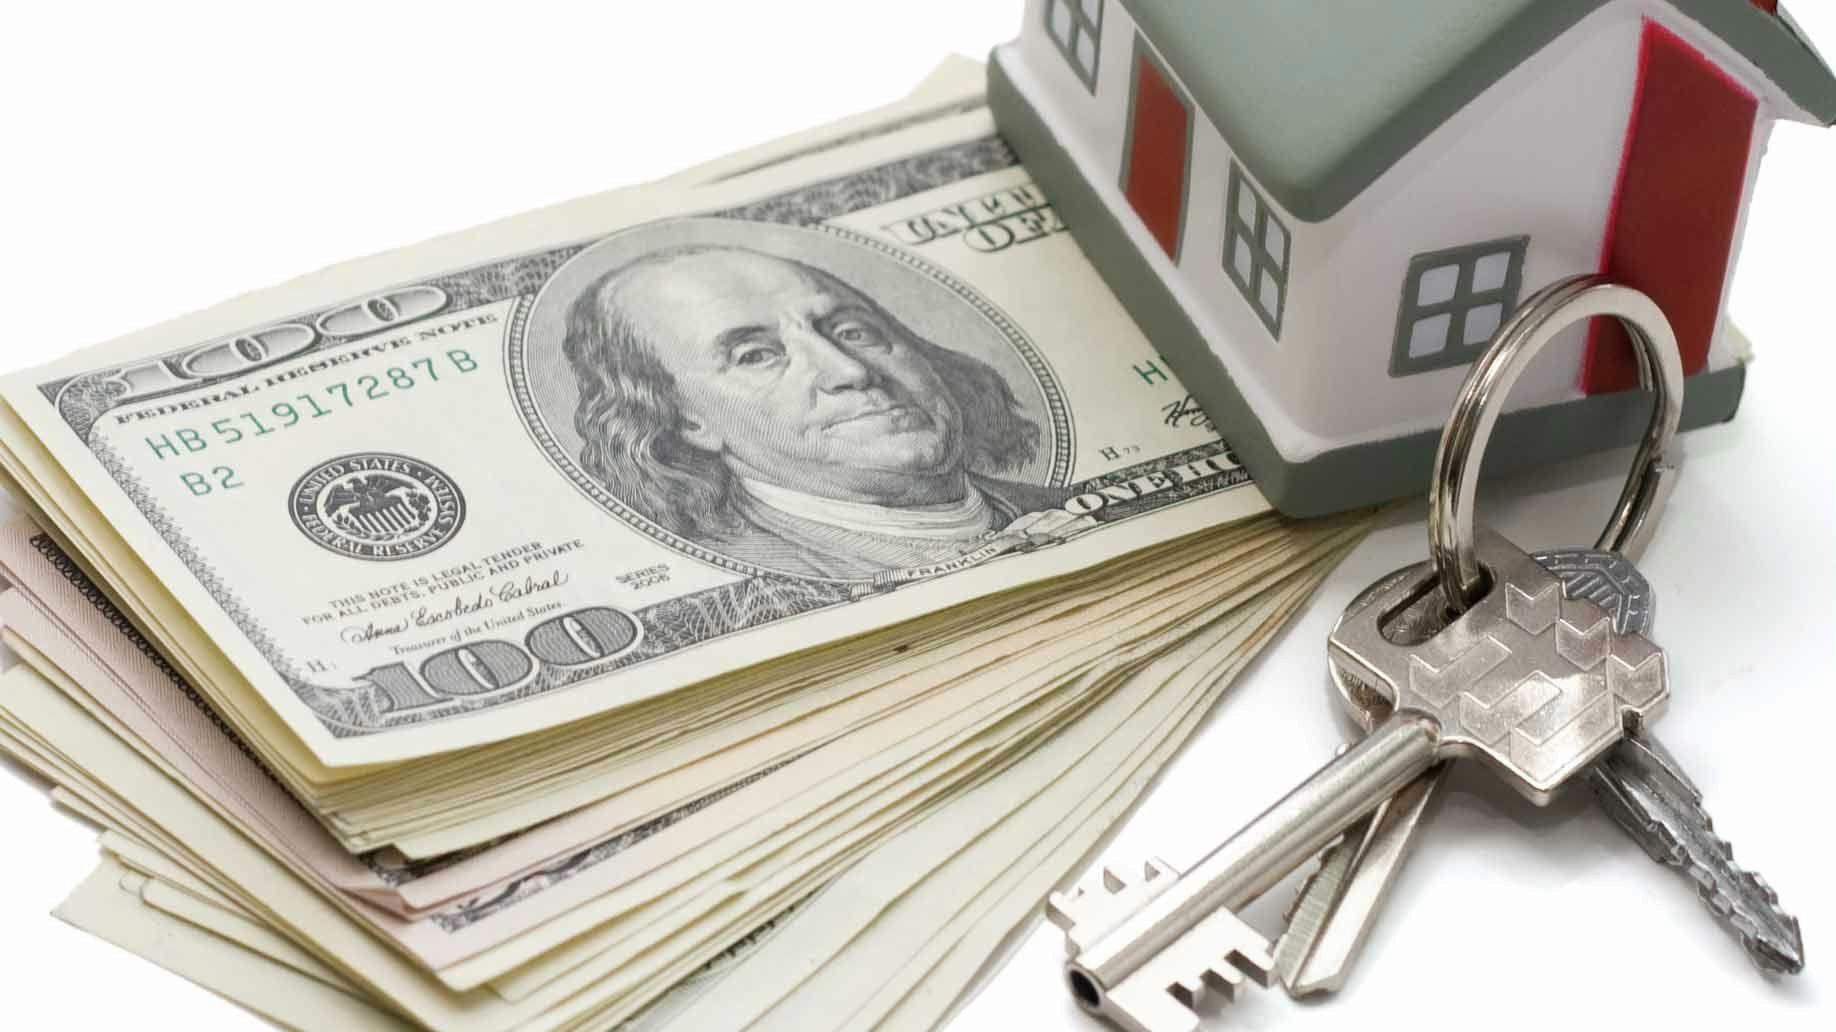 down-payment-money-house-keys-money